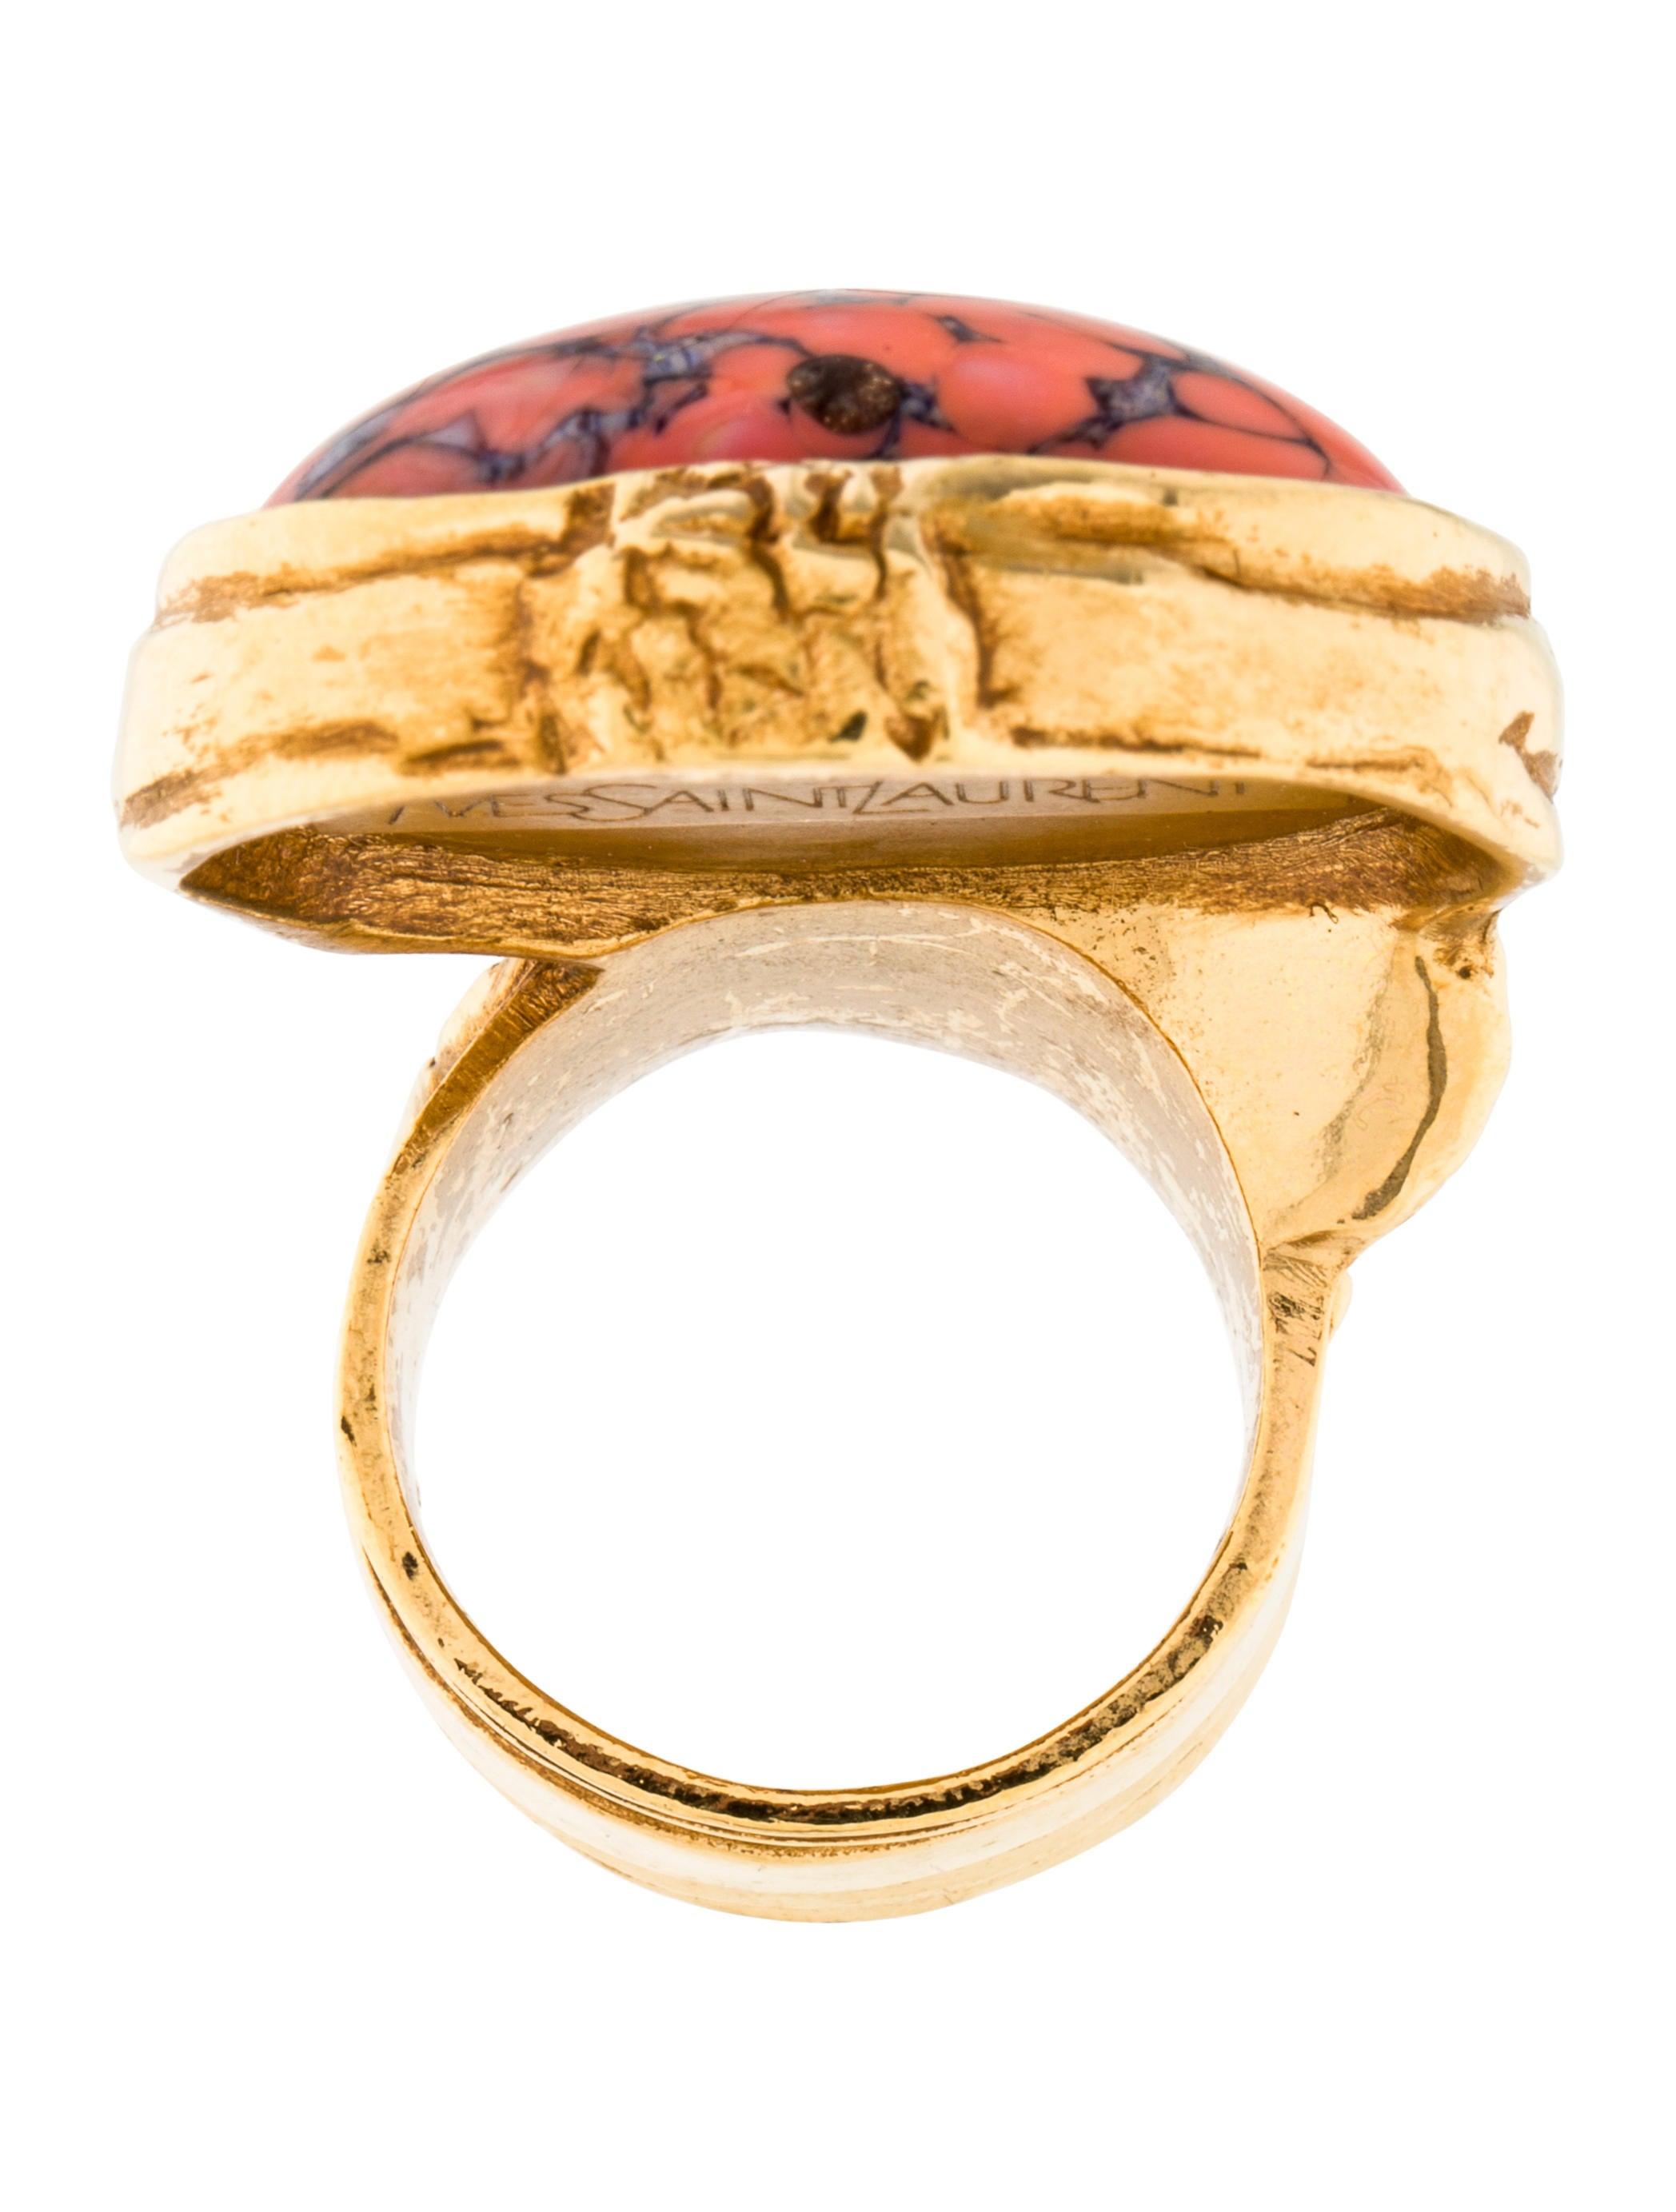 yves saint laurent arty ovale ring rings yve58795. Black Bedroom Furniture Sets. Home Design Ideas